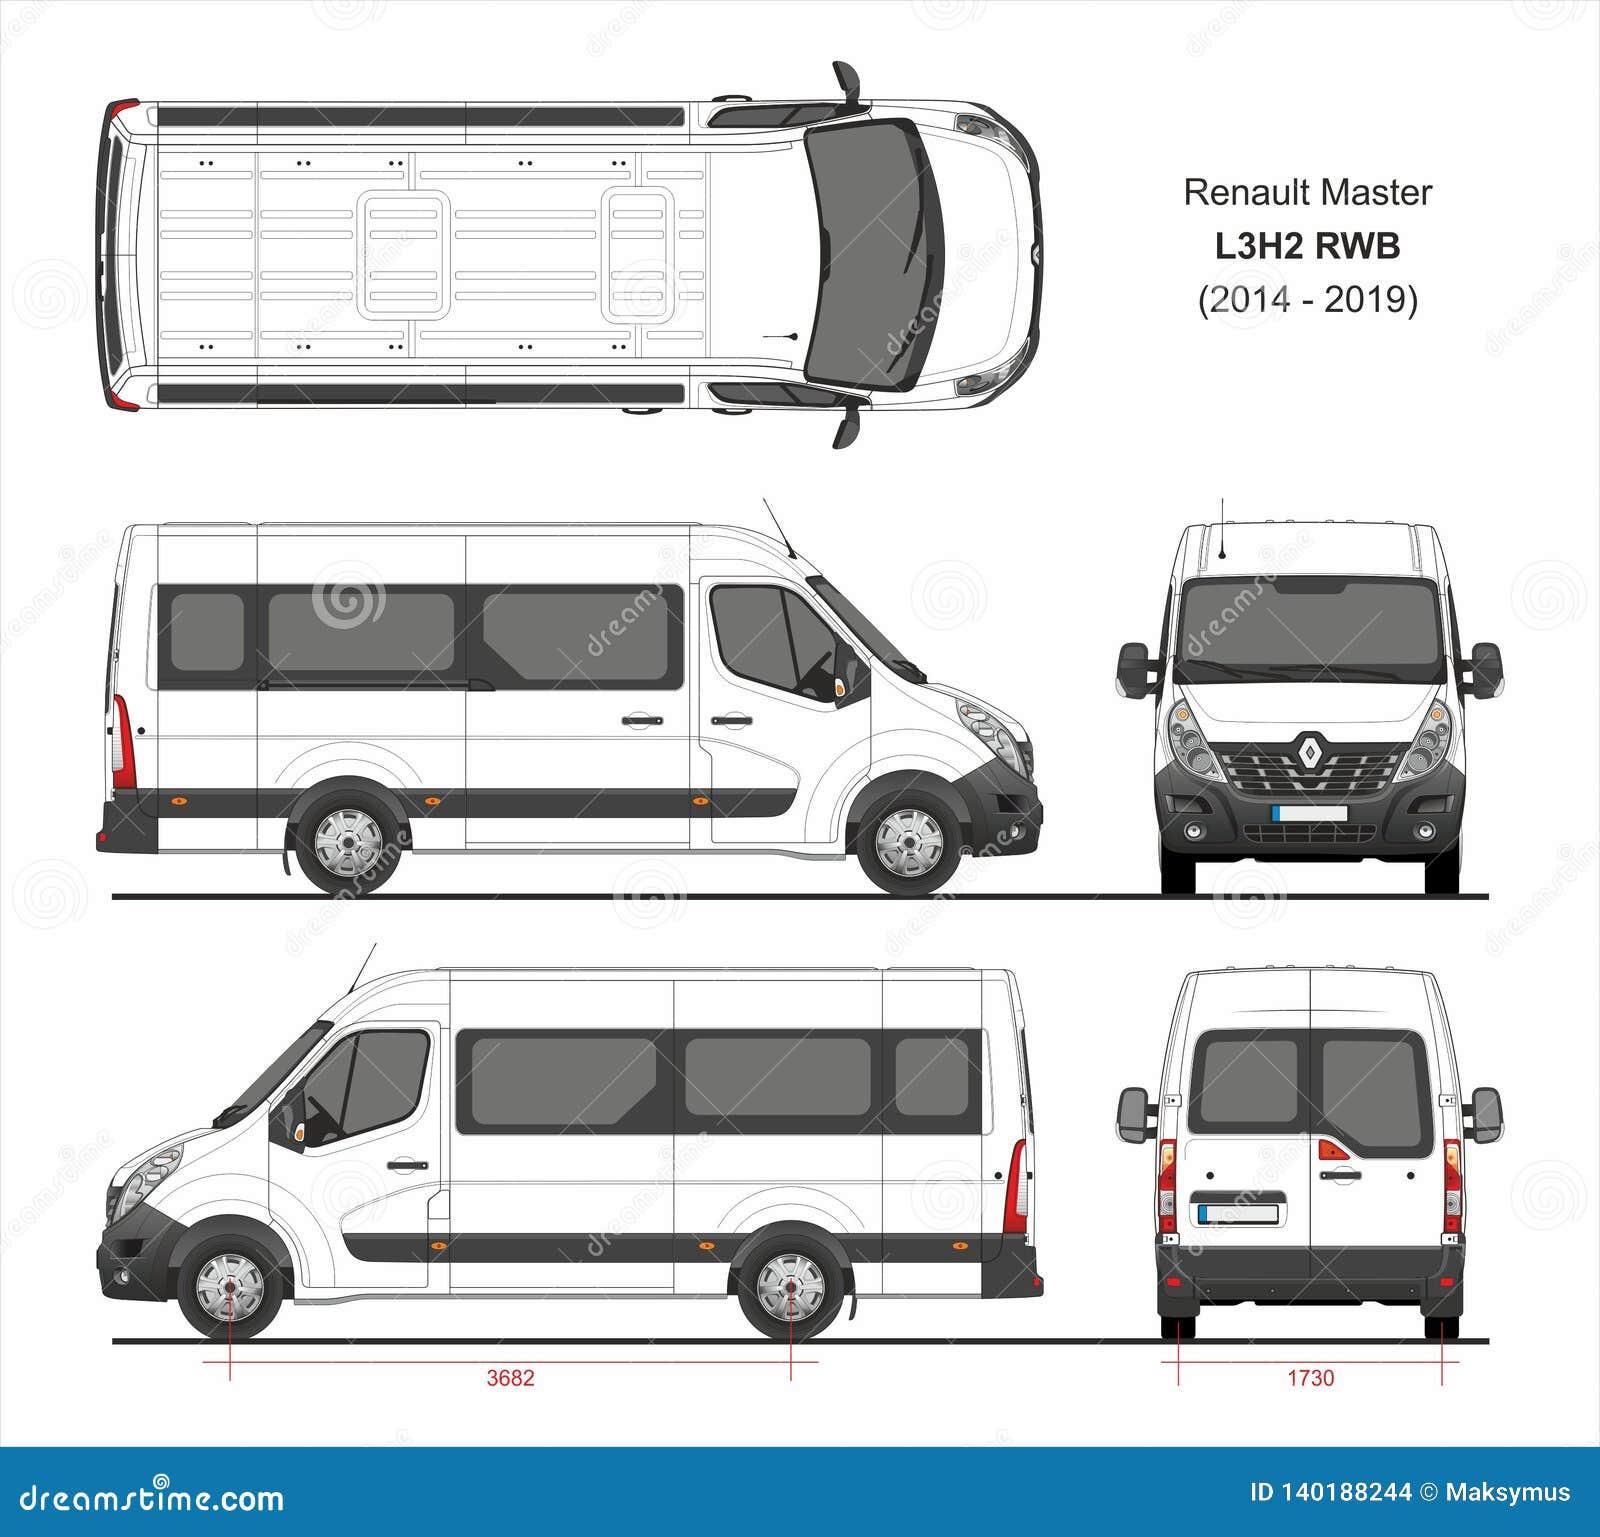 Renault Ilustracoes Vetores E Clipart De Stock 212 Stock Illustrations